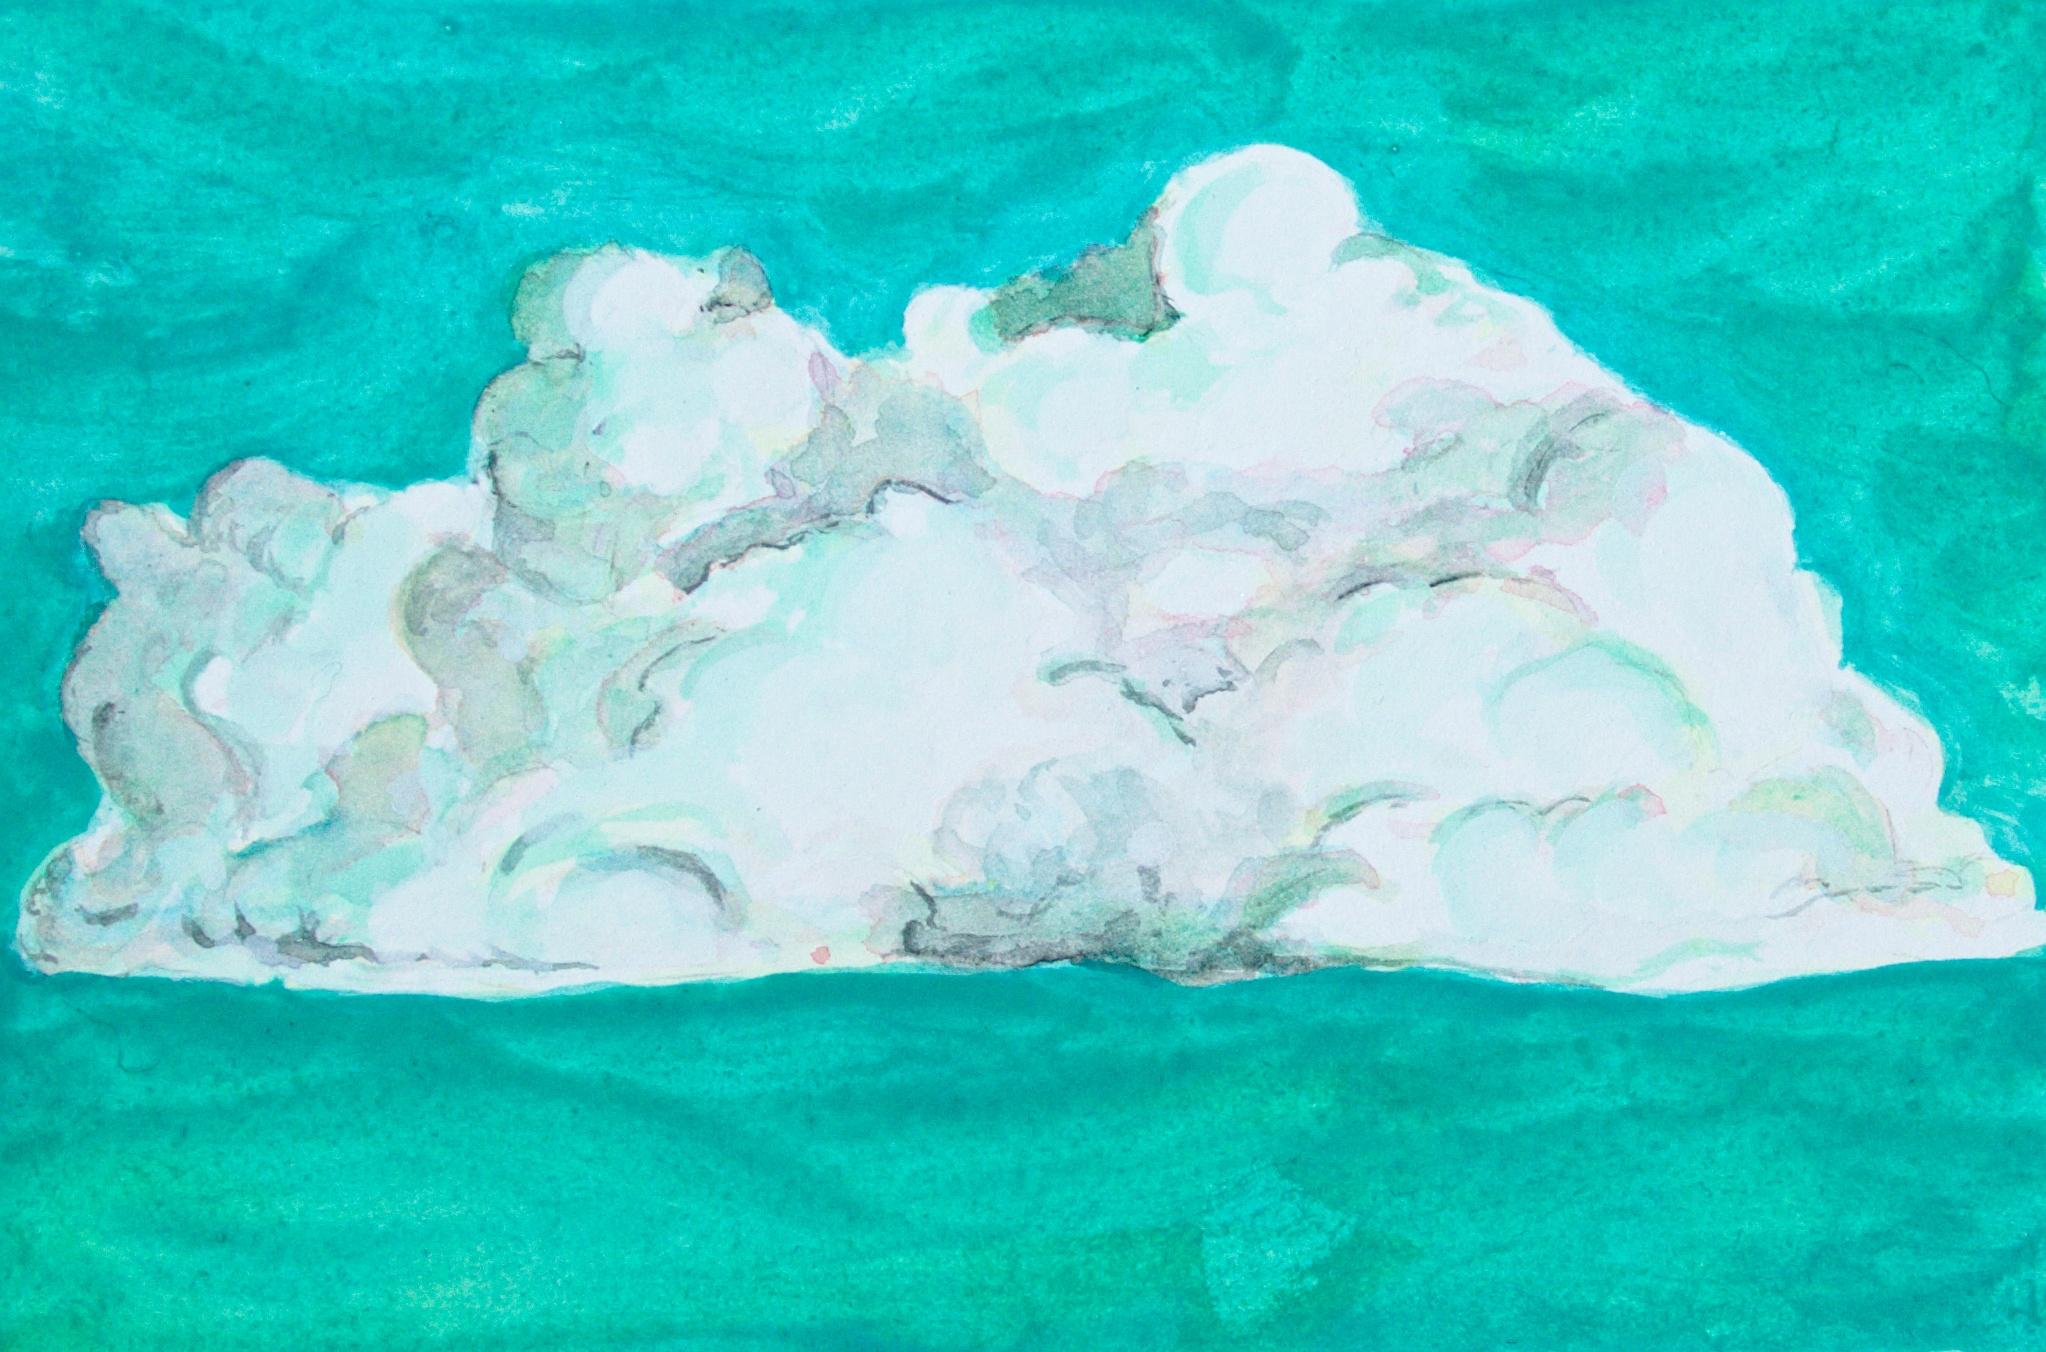 watercolor-cloud-painting-lazy.jpg